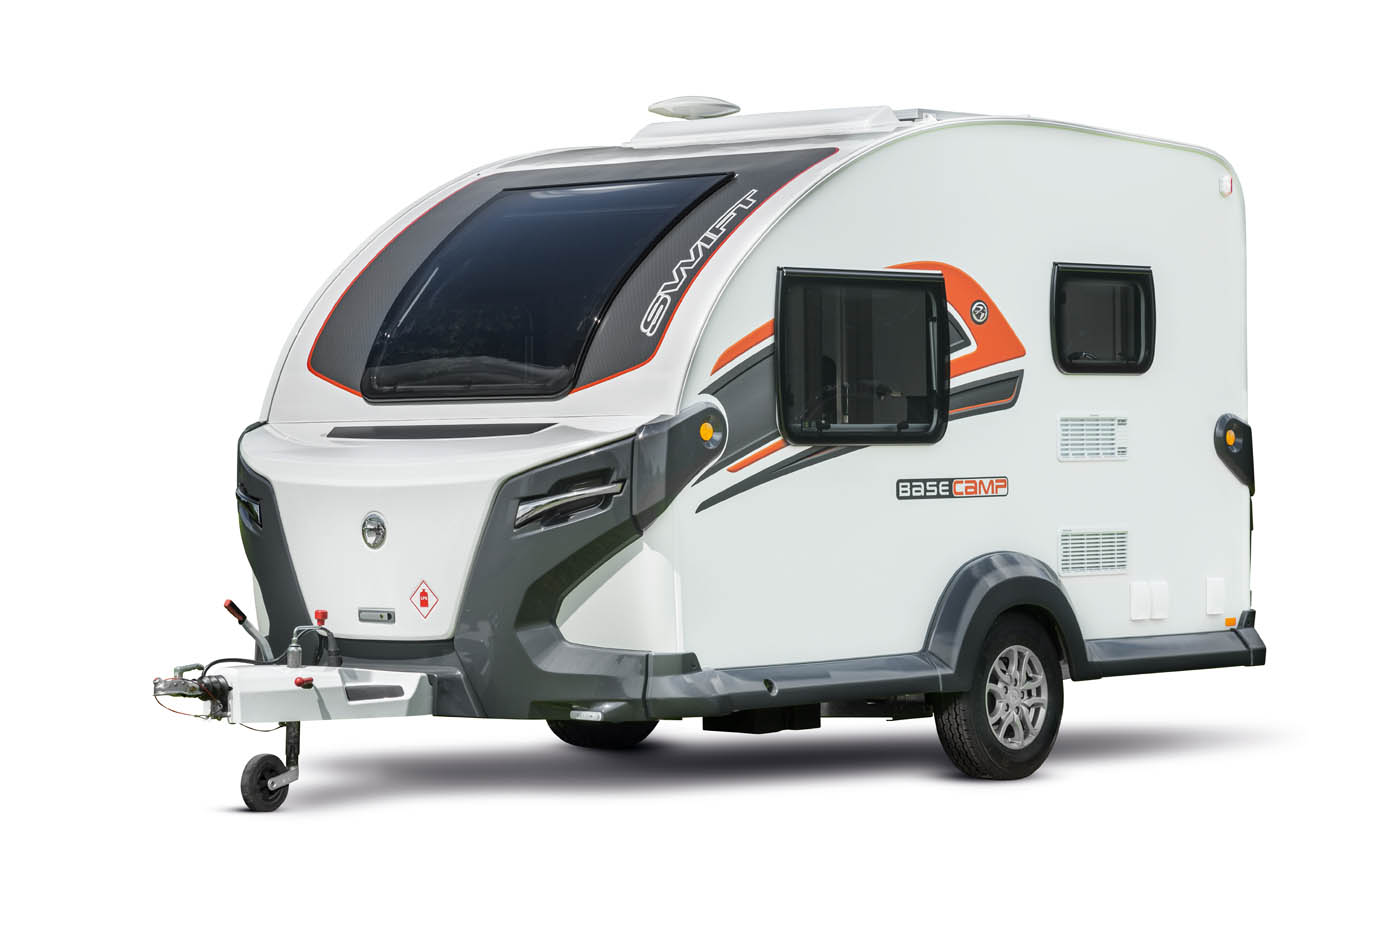 hight resolution of swift caravan fuse box